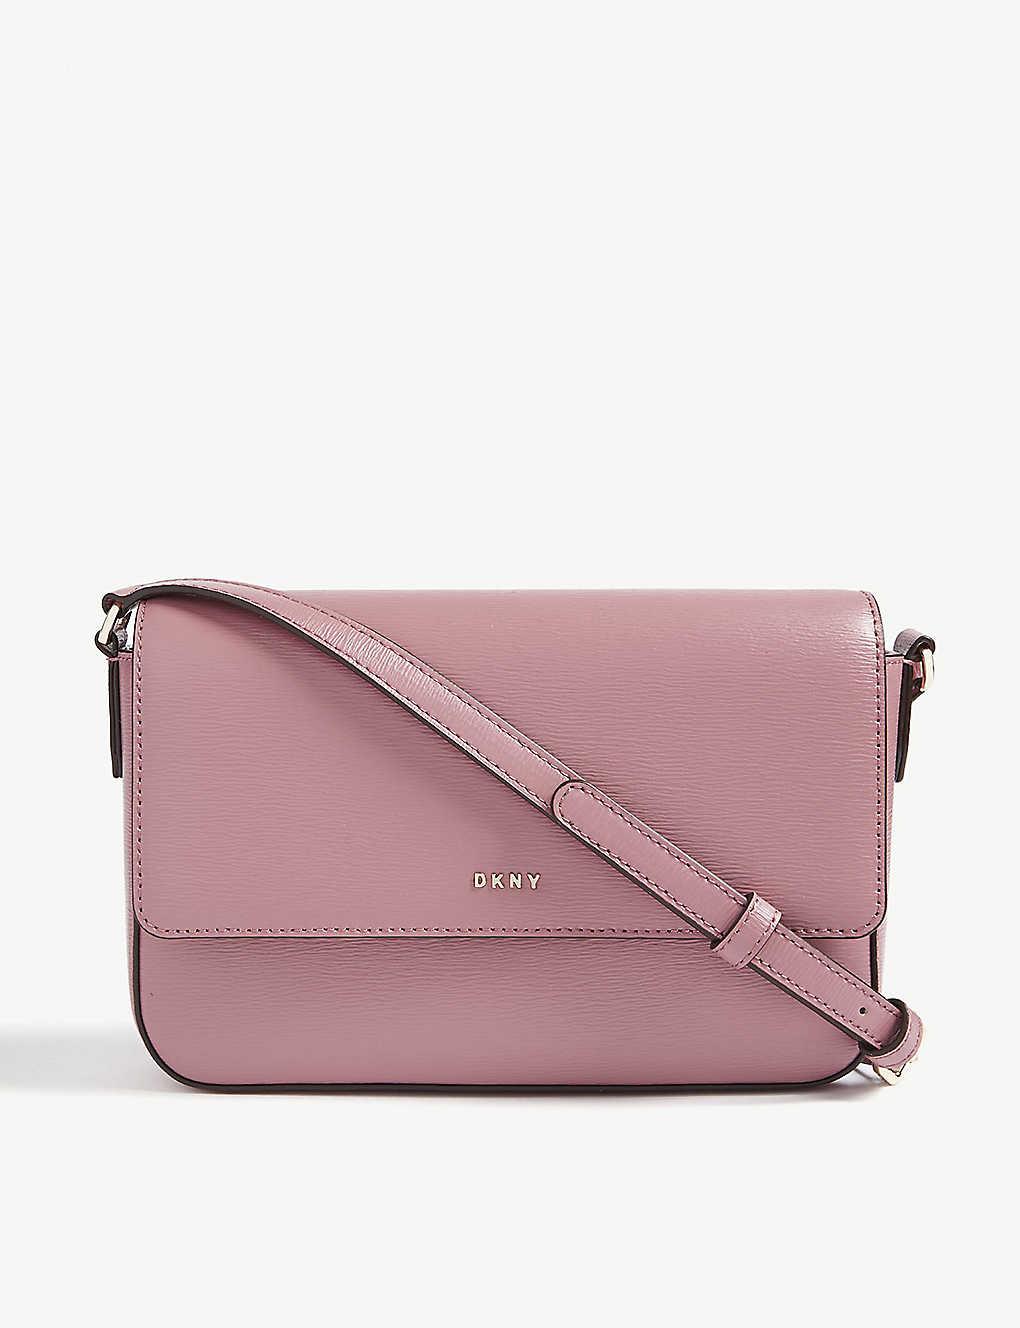 8106e636689 Bryant leather cross-body bag - Canyon rose ...